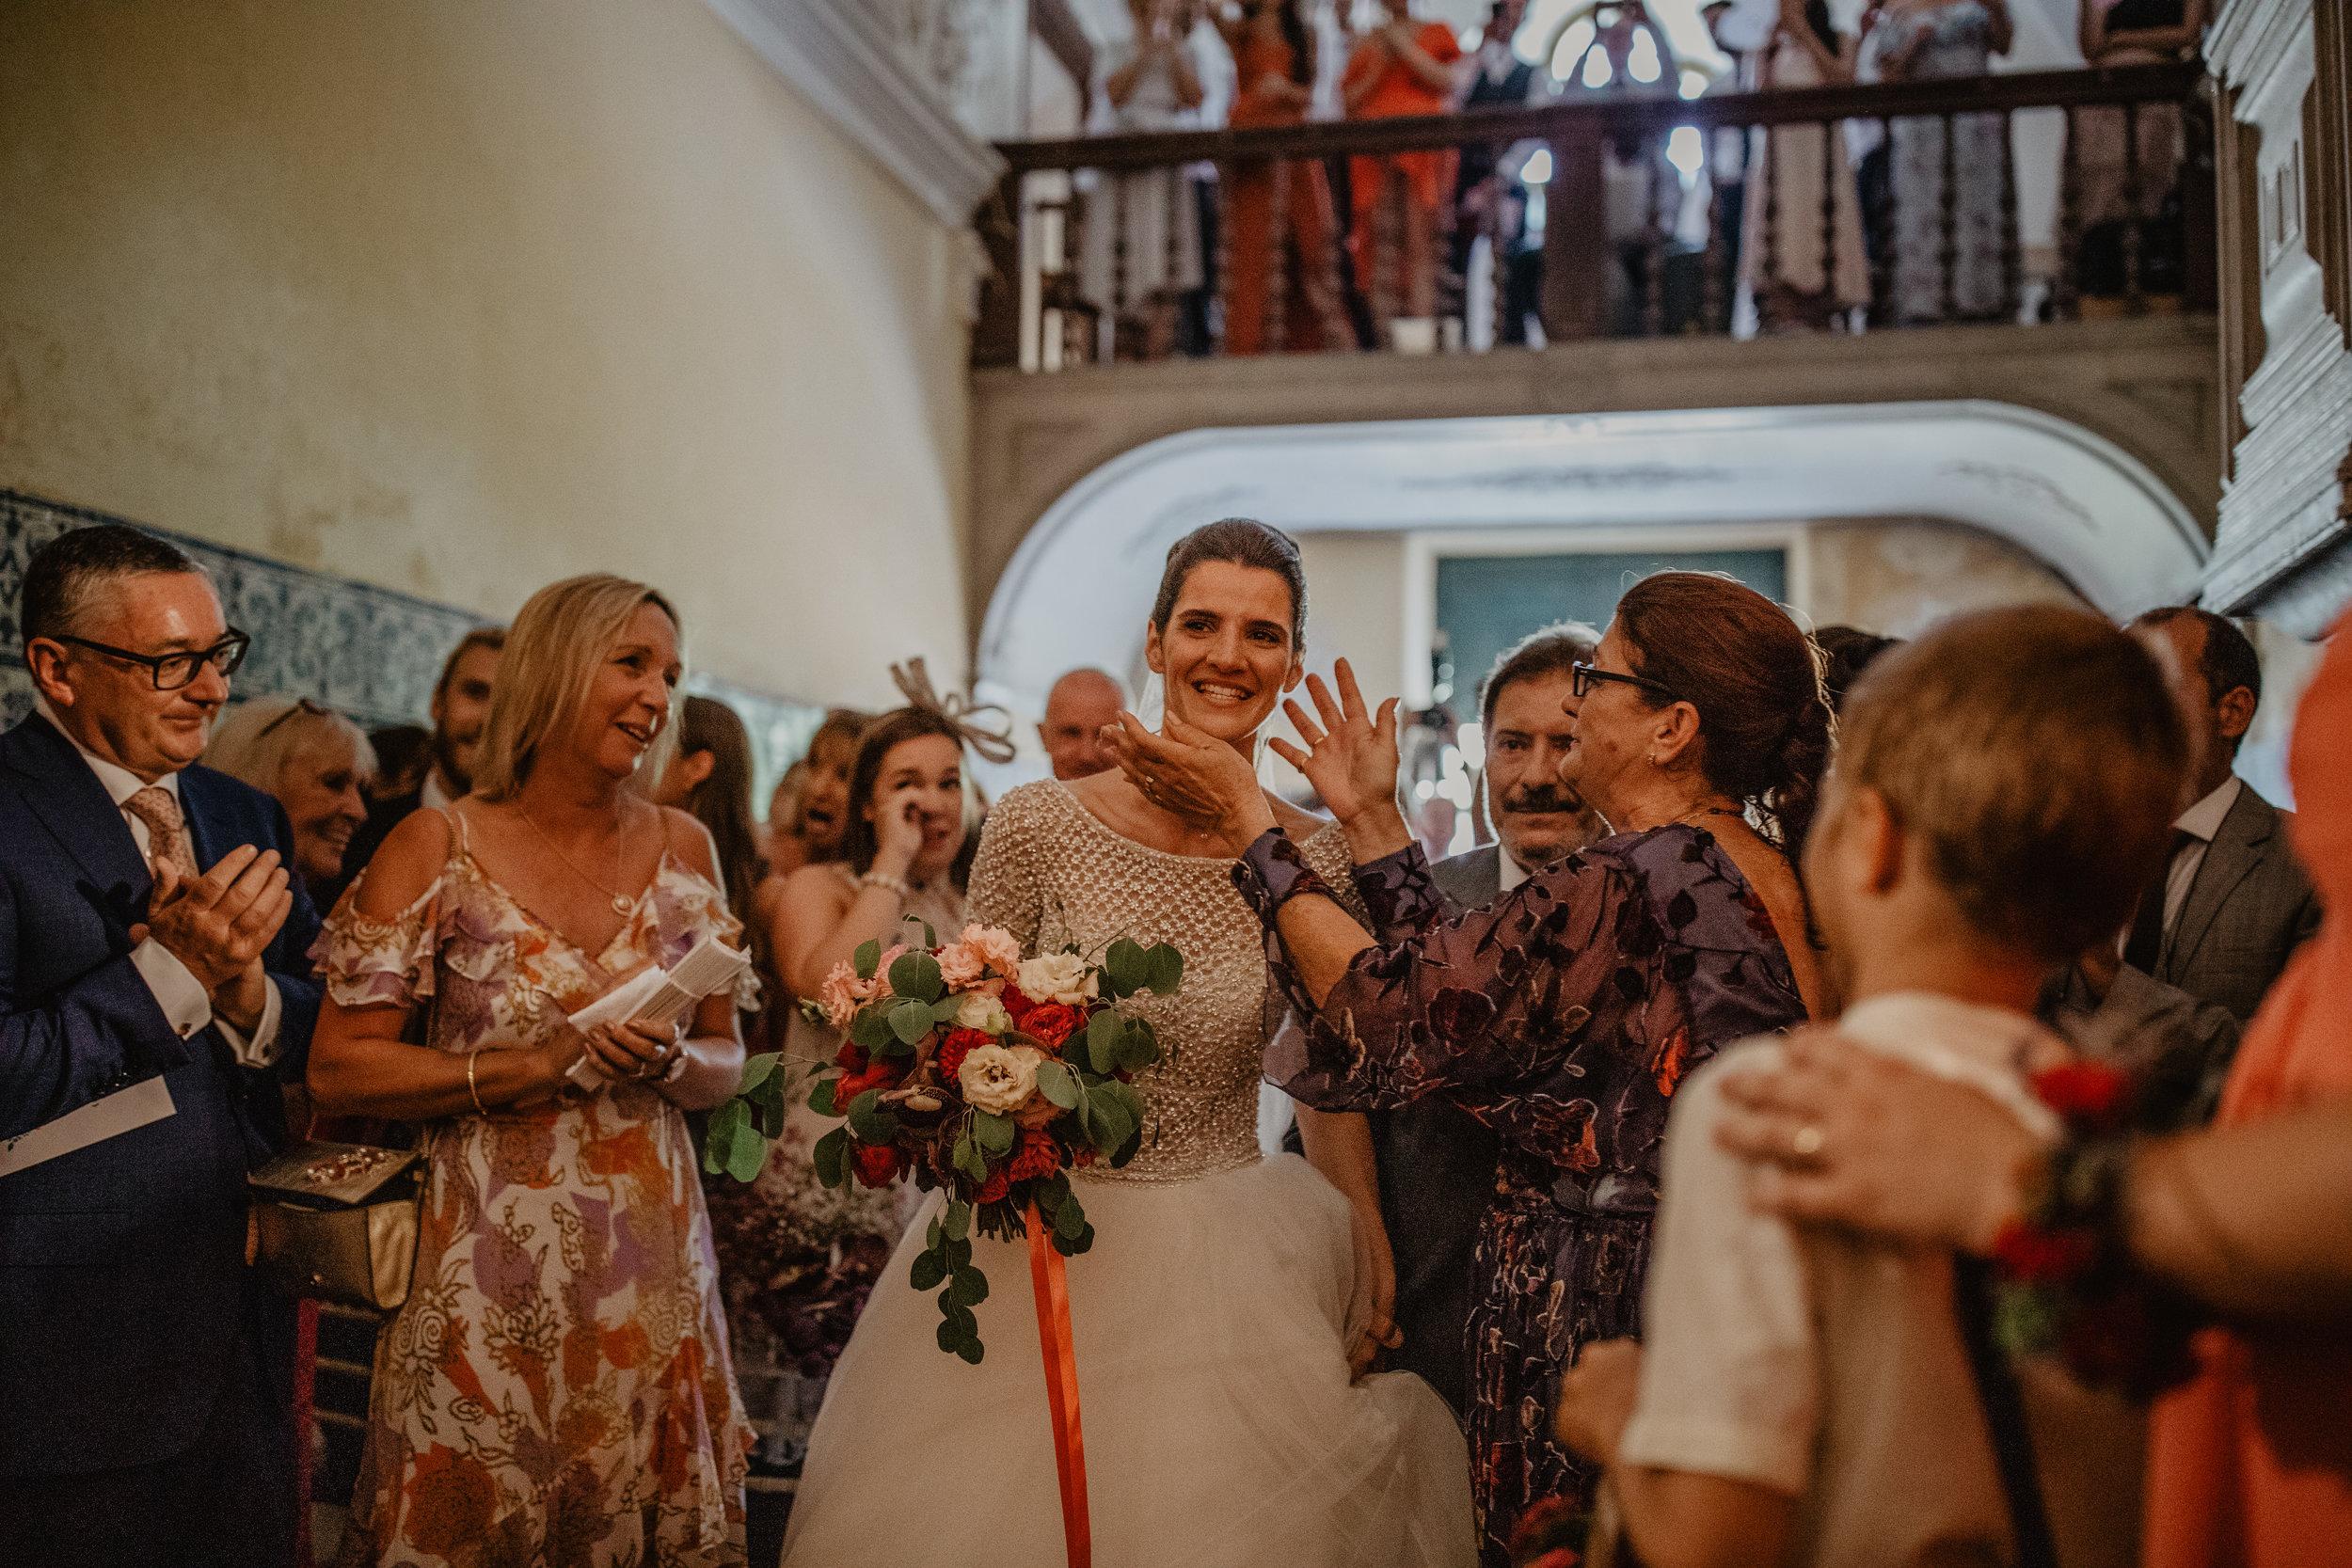 Lapela-photography-wedding-sintra-portugal-54.jpg